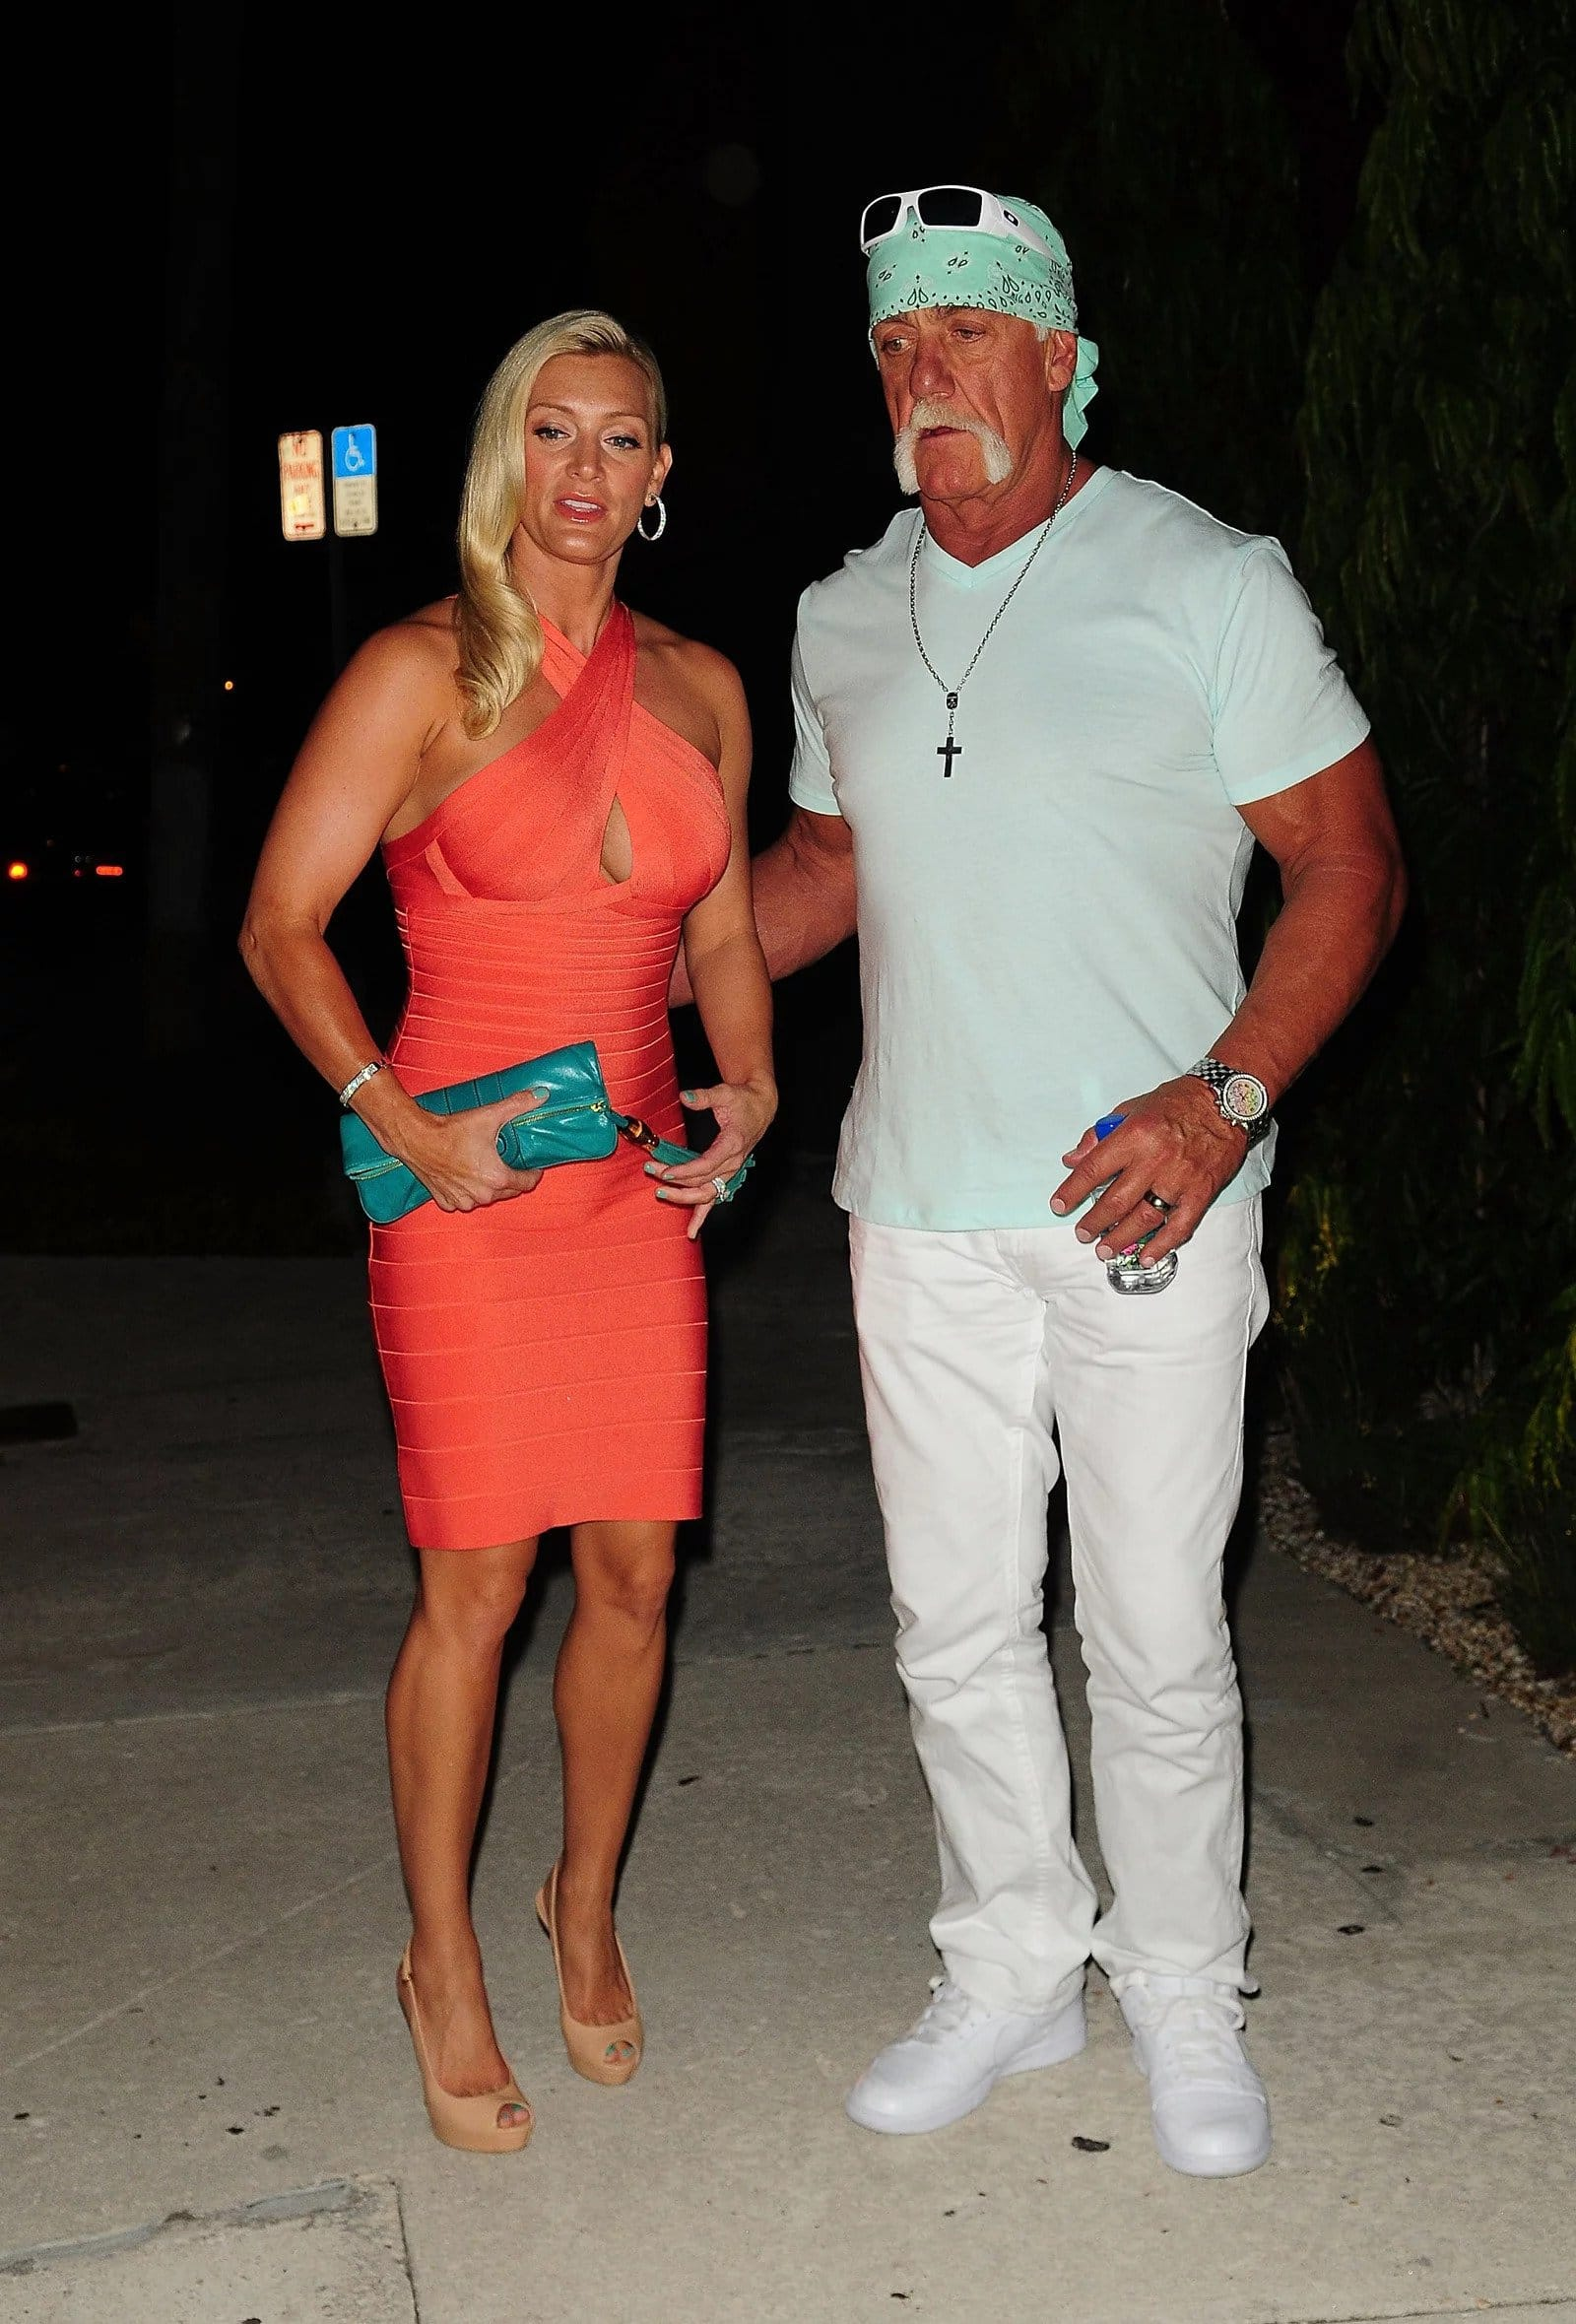 Hulk Hogan with his wife Jennifer